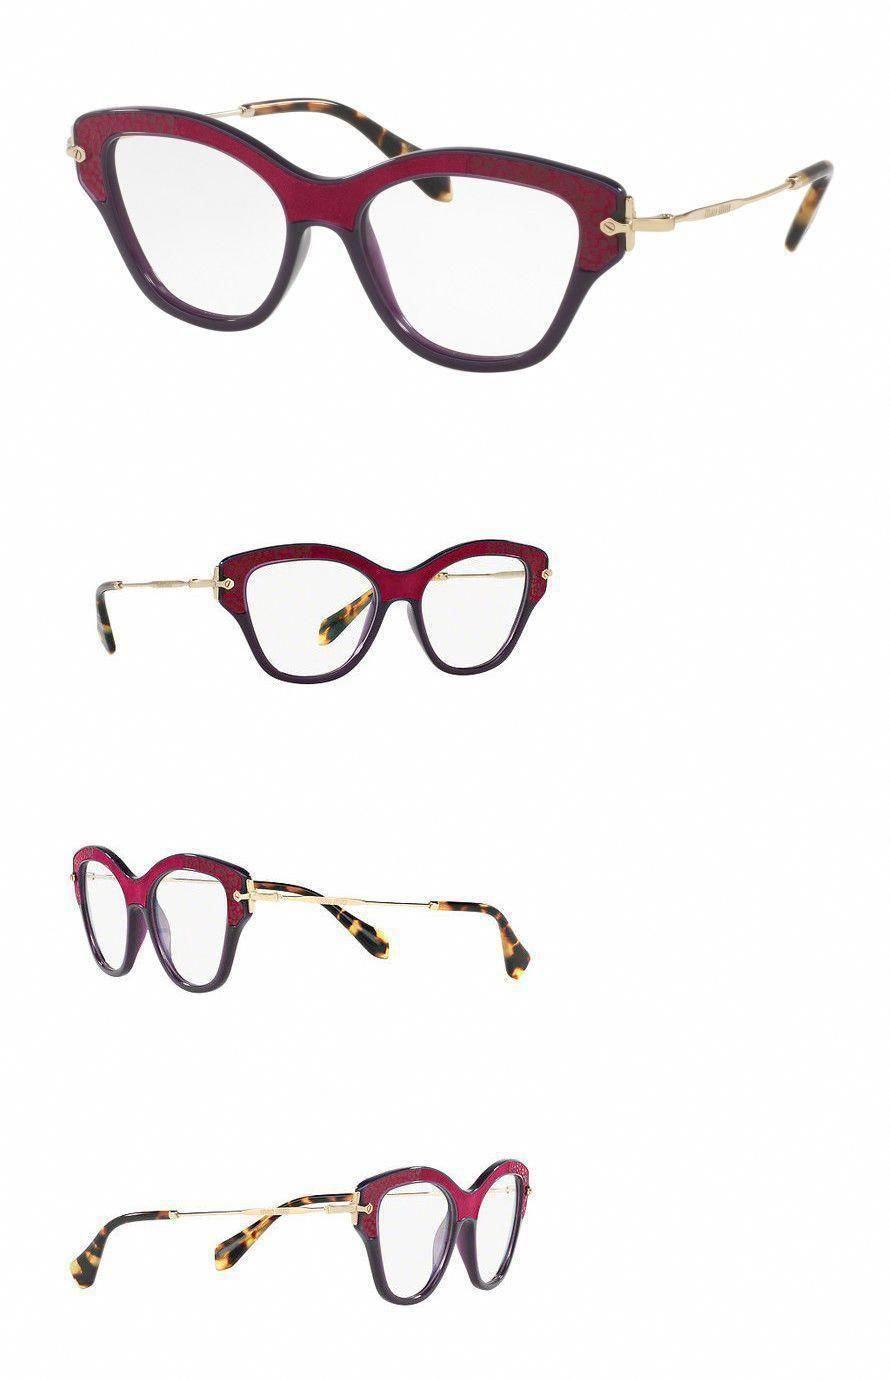 0fcbddee534 Eyeglass Frames 180957  New Miu Miu Mu07ov-U6a1o1 52Mm Wayfarer Women S  Violet Frame